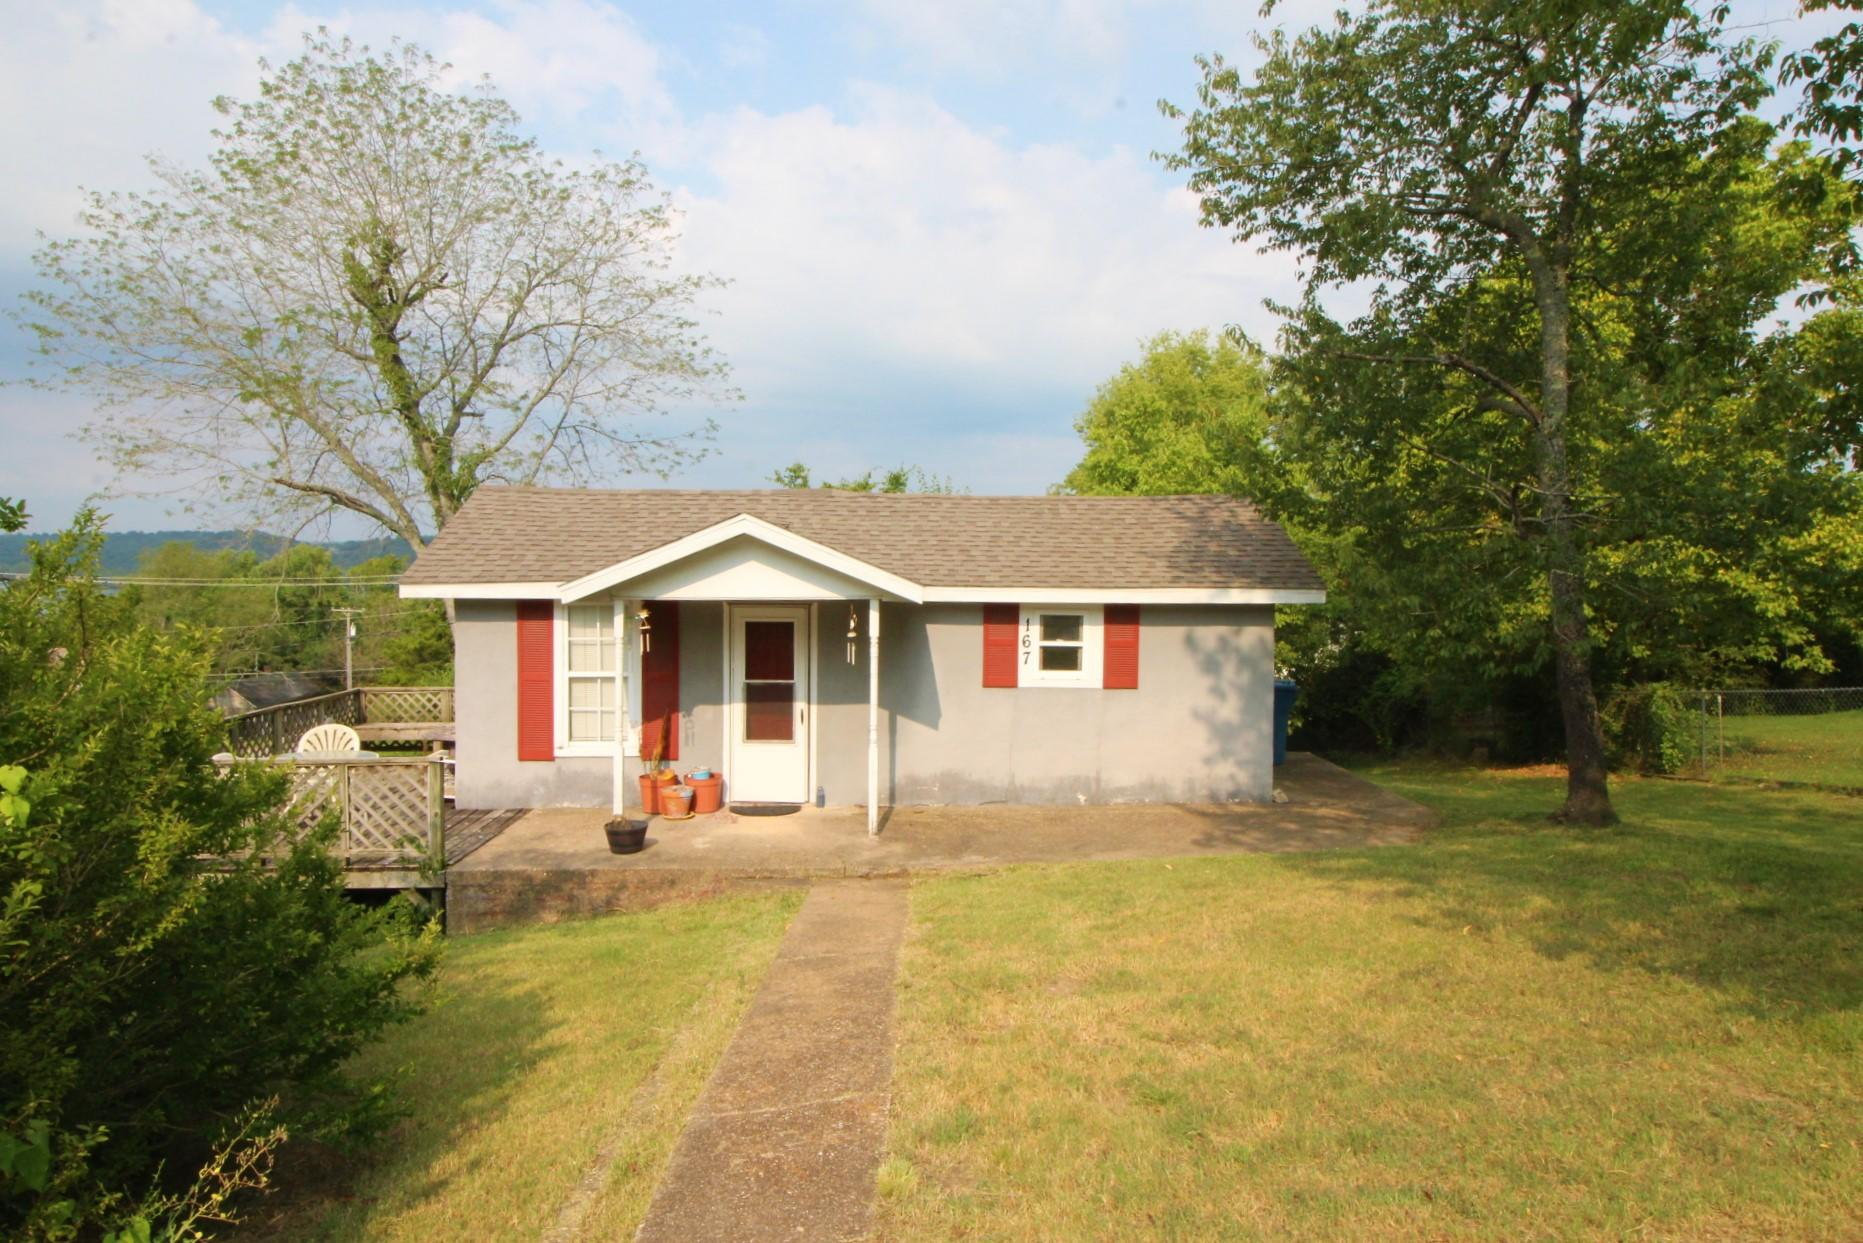 167 Pine Street Forsyth, MO 65653